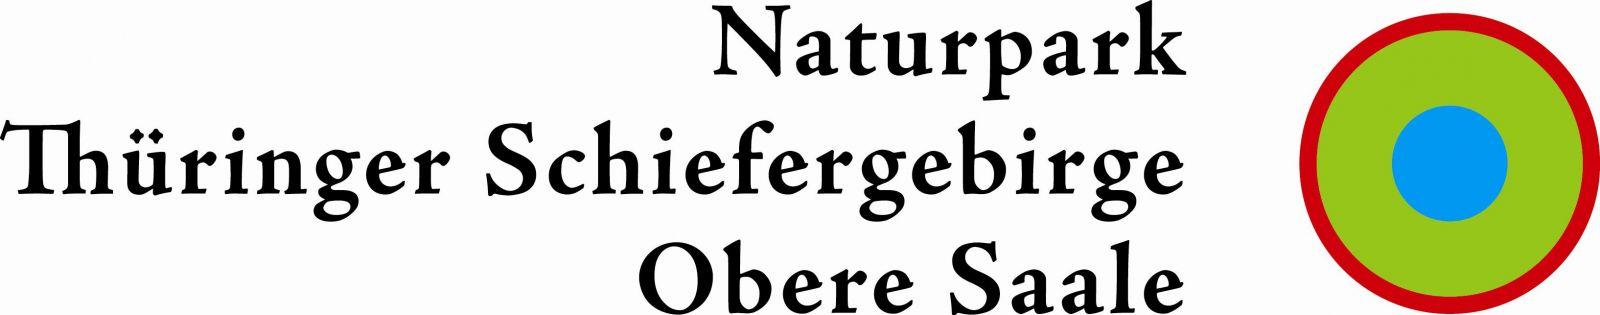 Bild Naturpark Thüringer Schiefergebirge Obere Saale